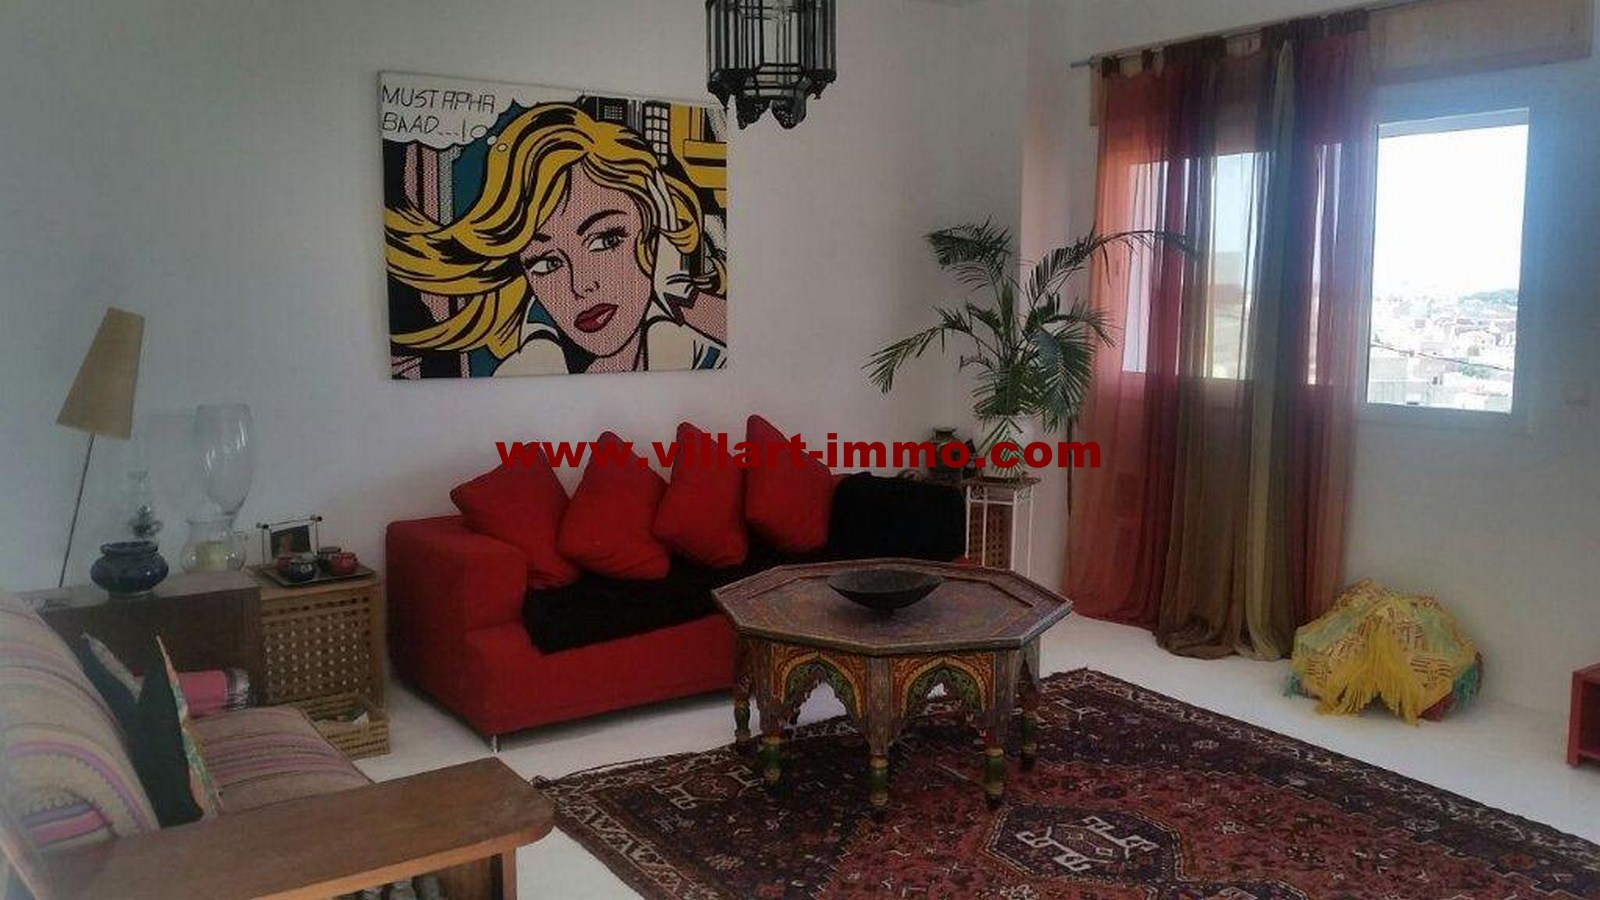 3-vente-villa-tanger-autres-salon-3-vv454-villart-immo